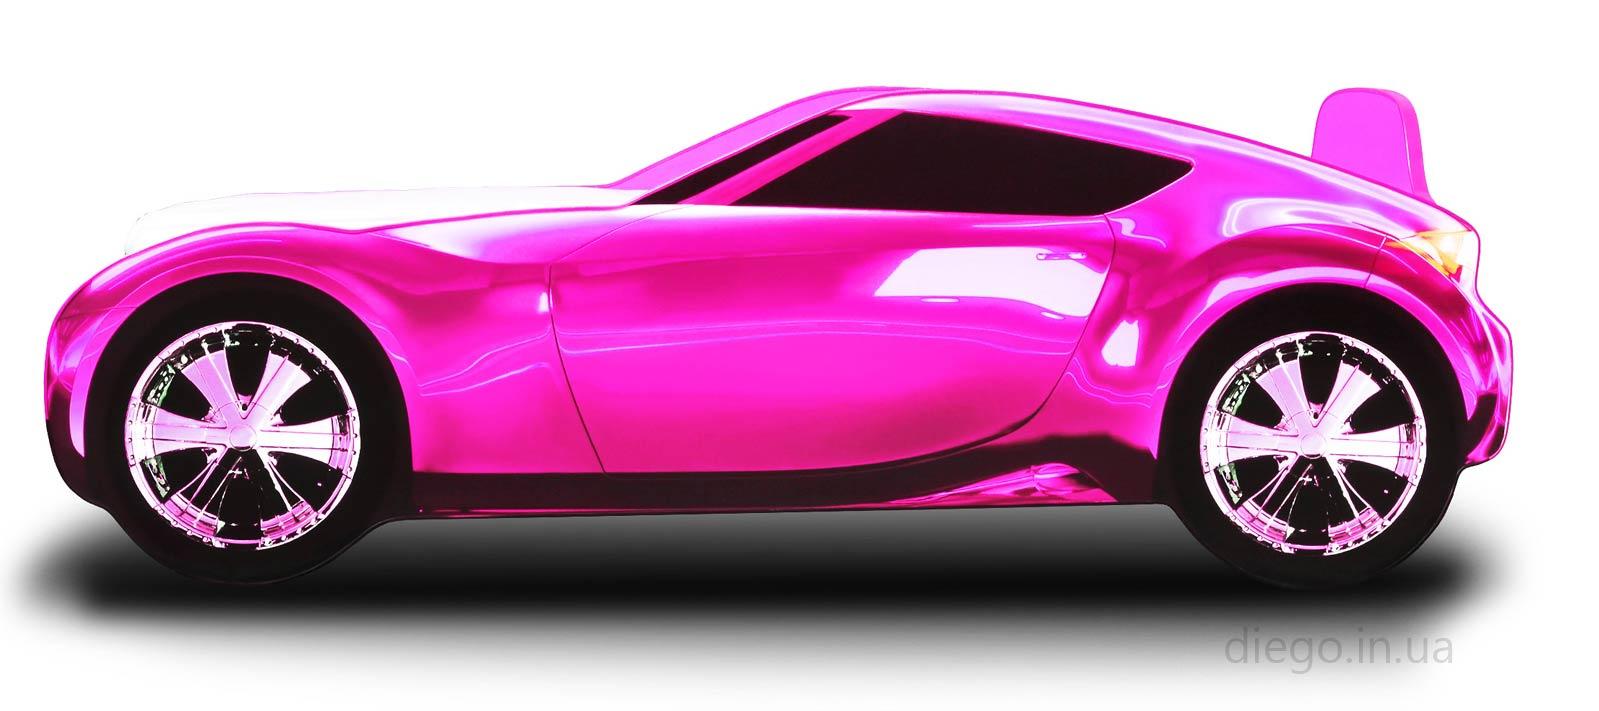 Кровать Galaxy розового цвета